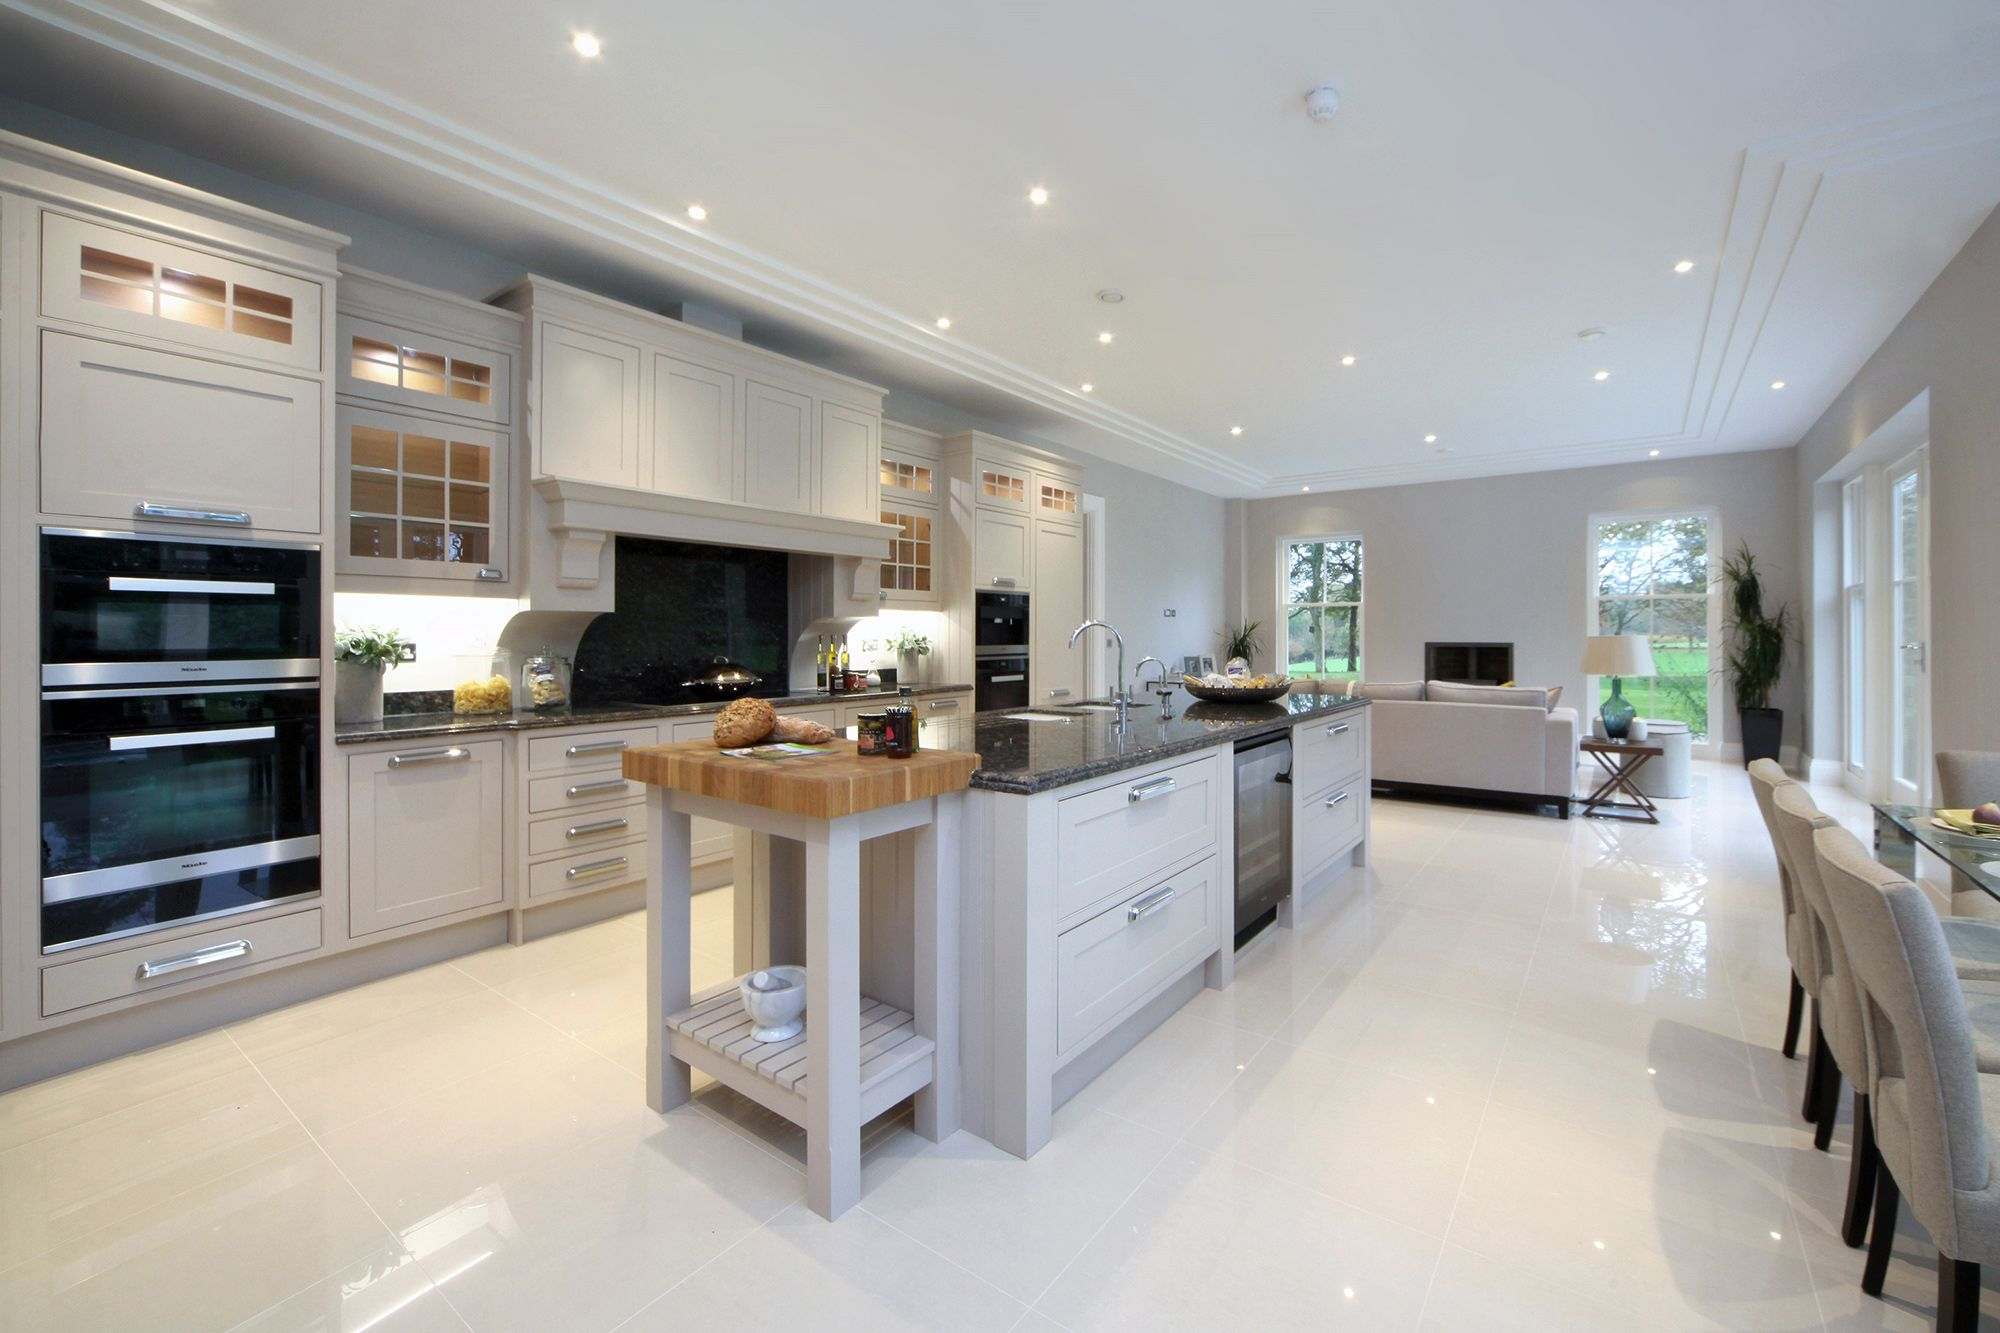 Burford Place Open Plan Kitchen With Breakfast Bar Island Stunning